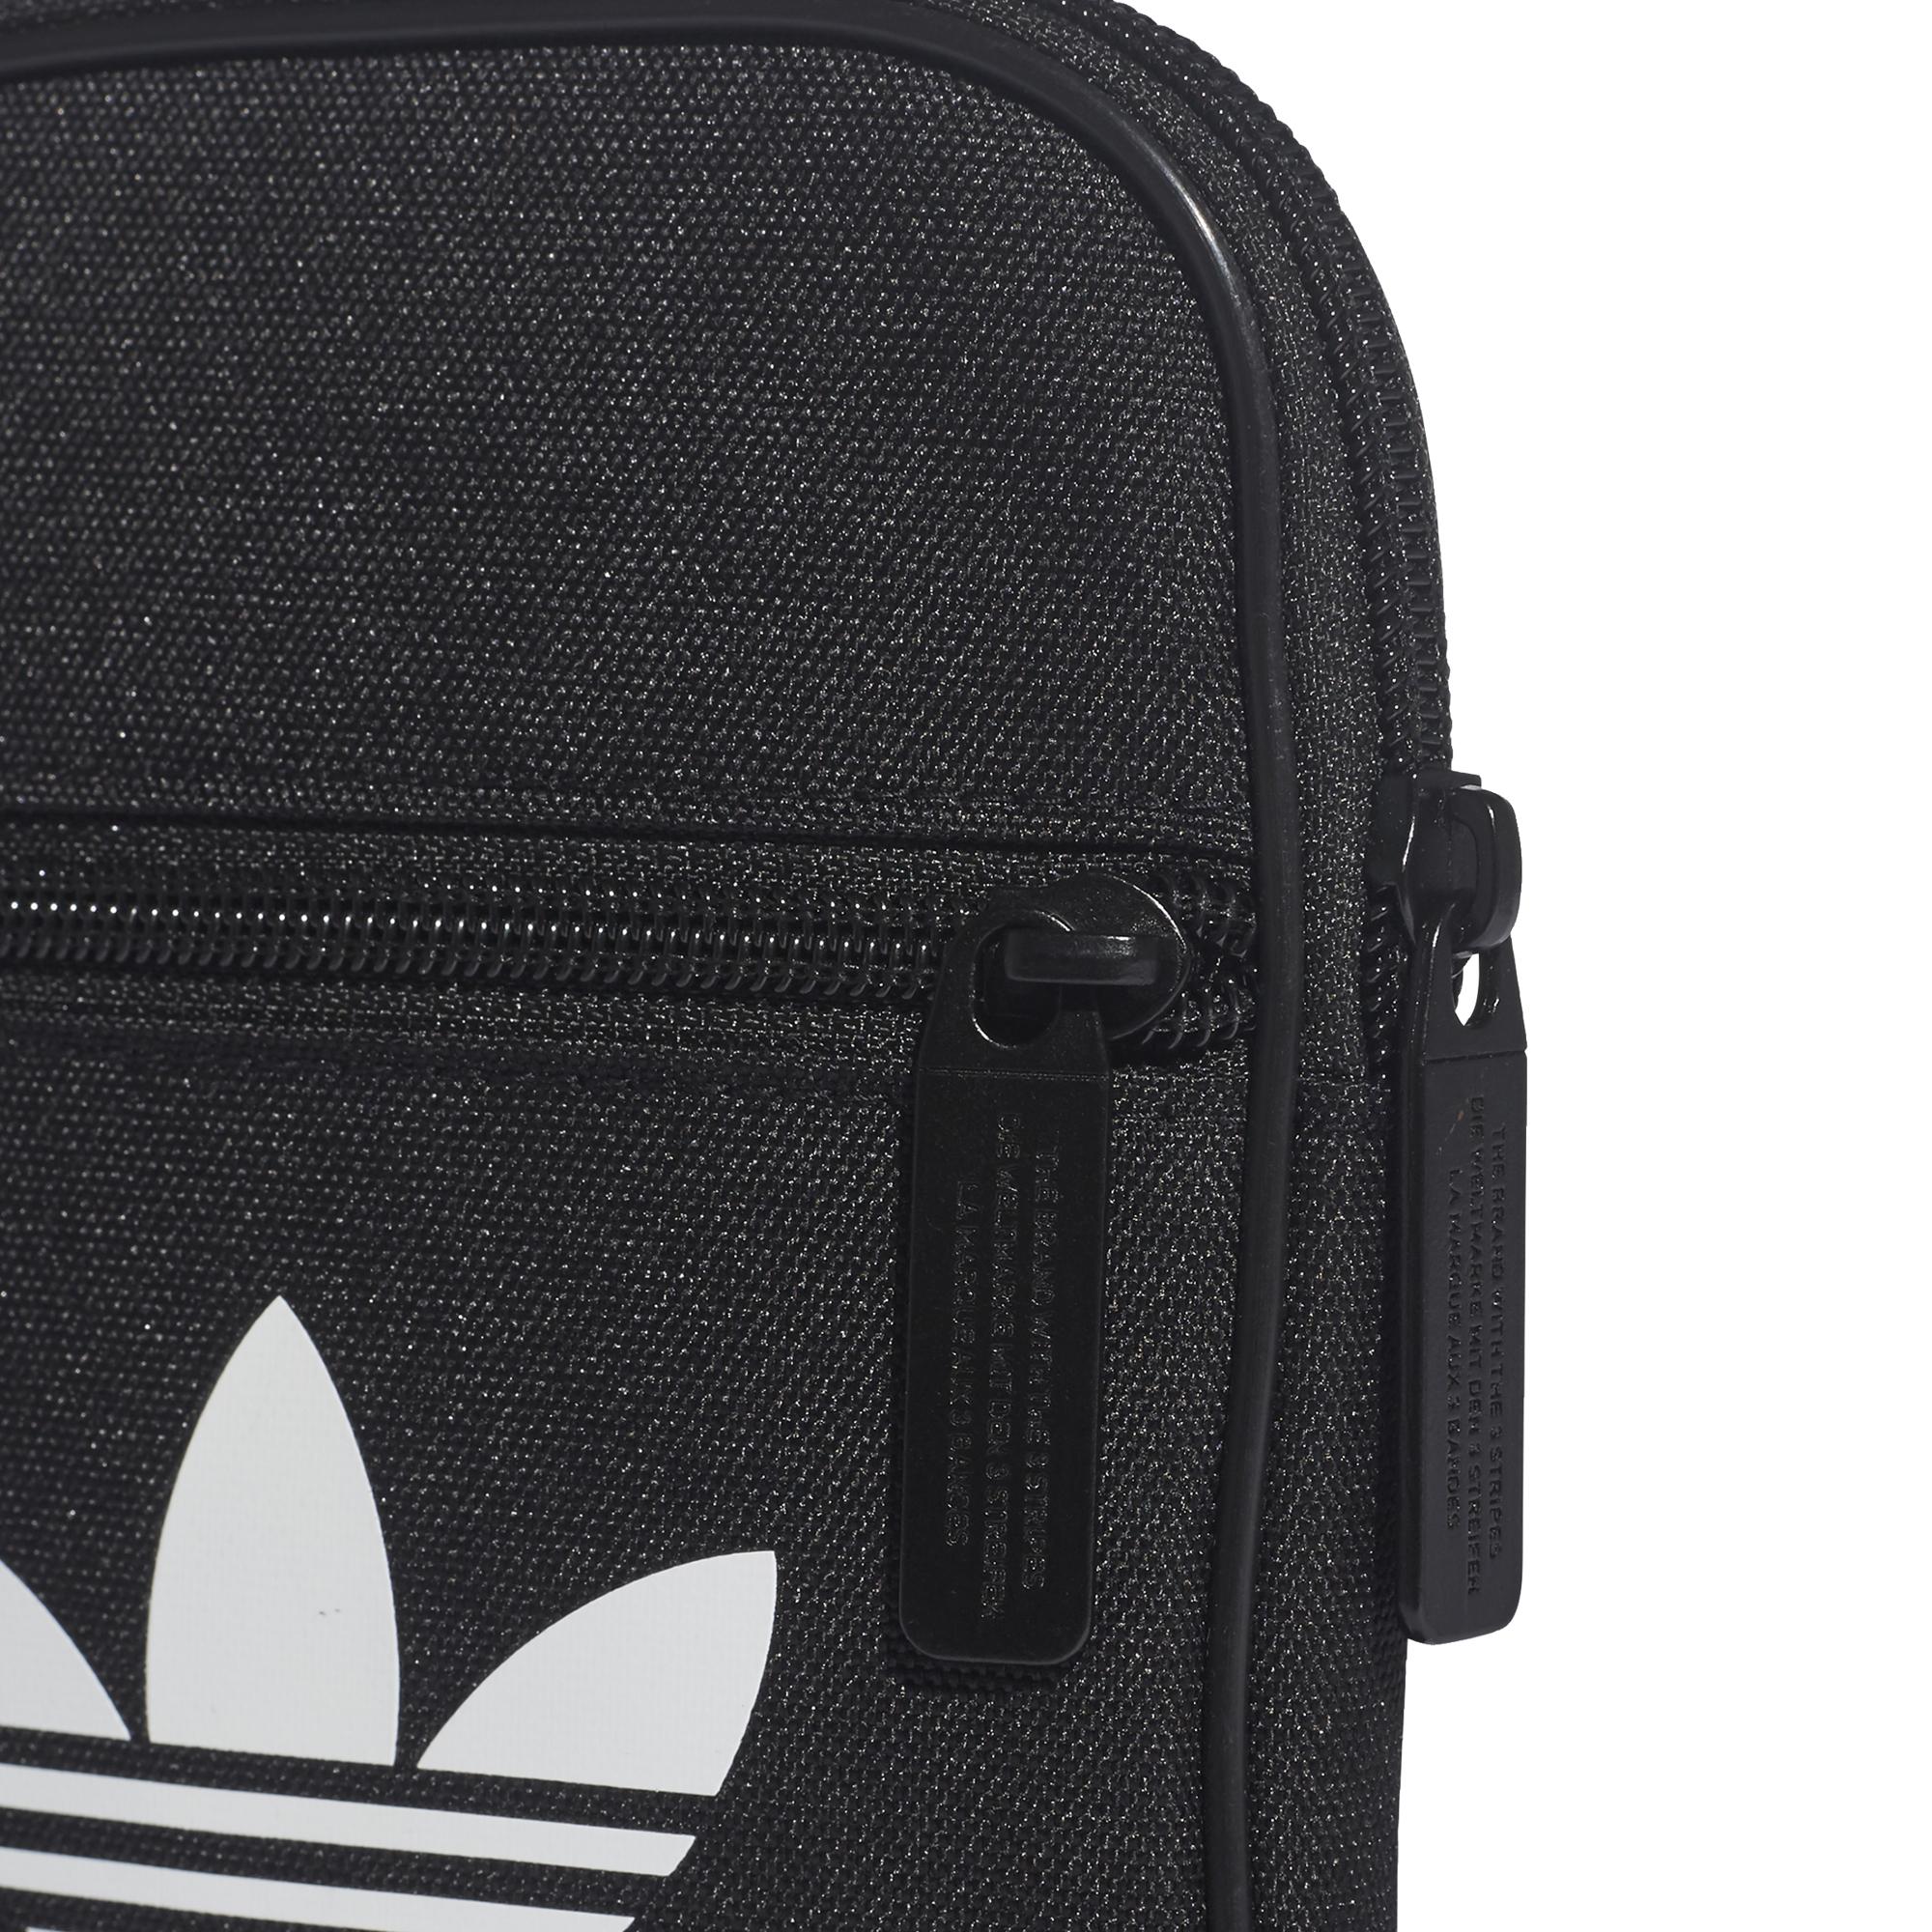 98841ad9bf4e8 mała czarna torebka saszetka adidas Trefoil Festival Bag BK6730 ...